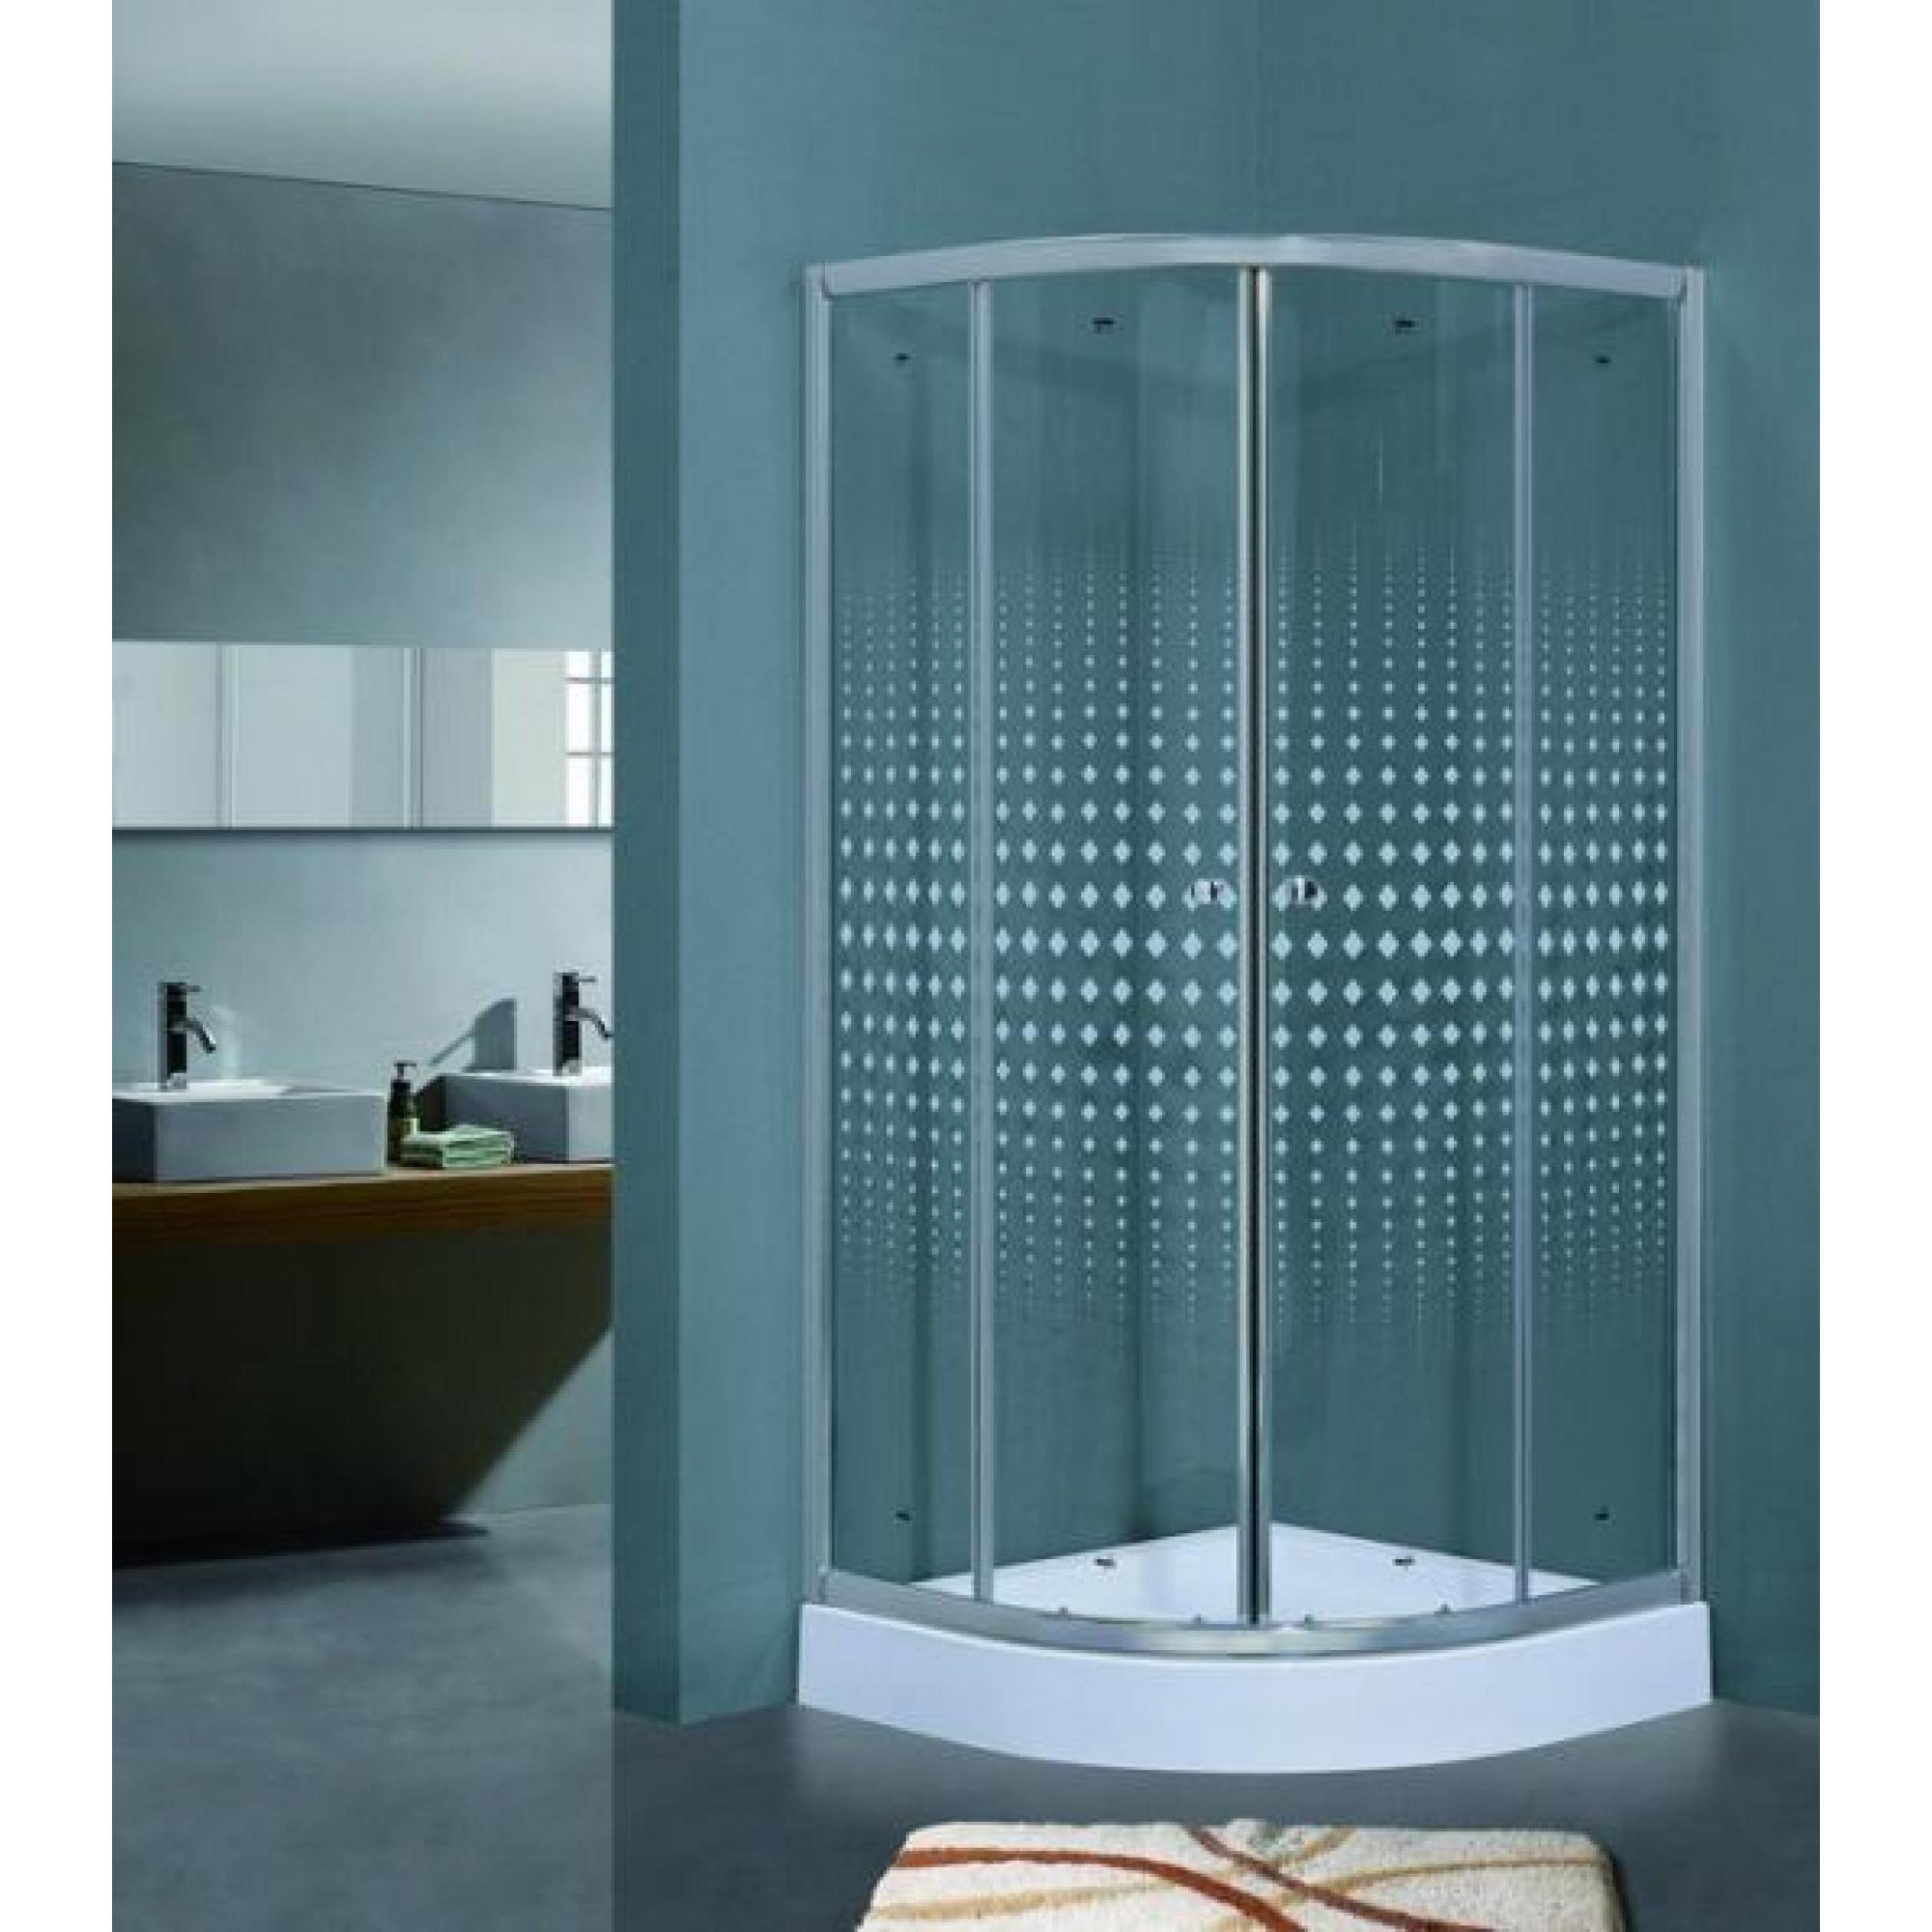 Душевой уголок Timo TL-1101 F душевой уголок timo biona lux tl 1101 fabric glass 100х100х200 см